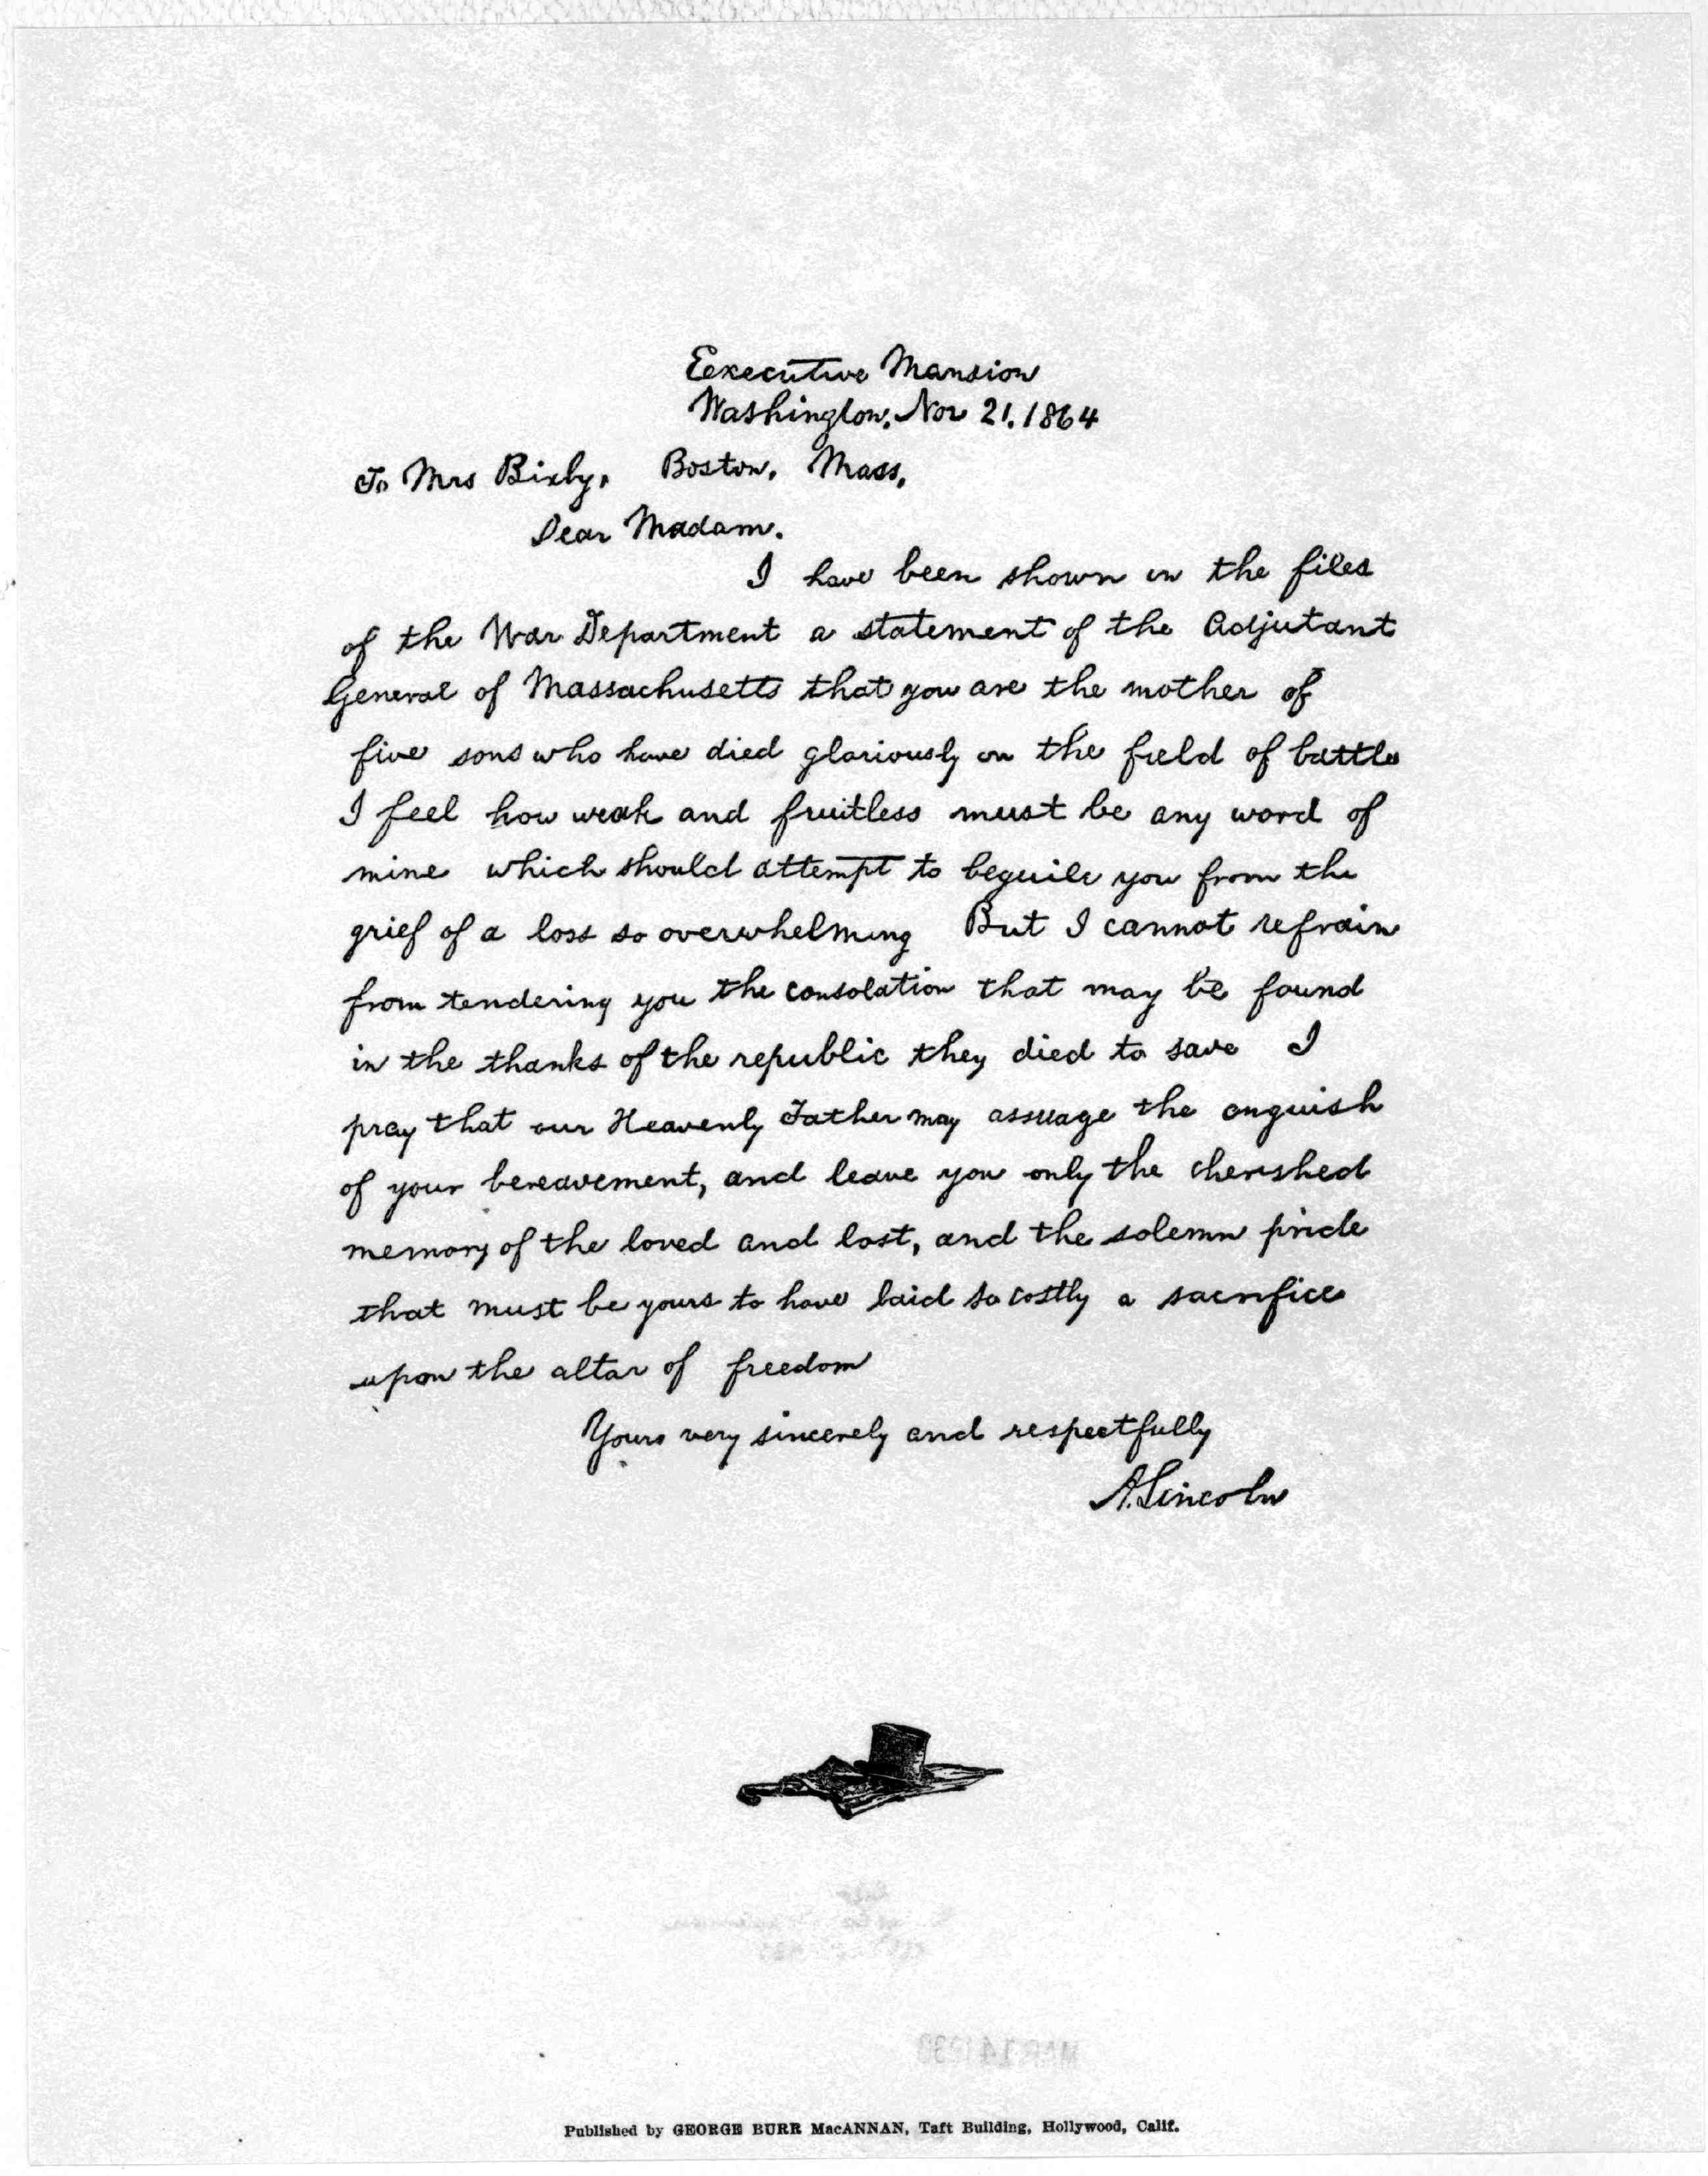 Writing A Jewish Condolence Letter